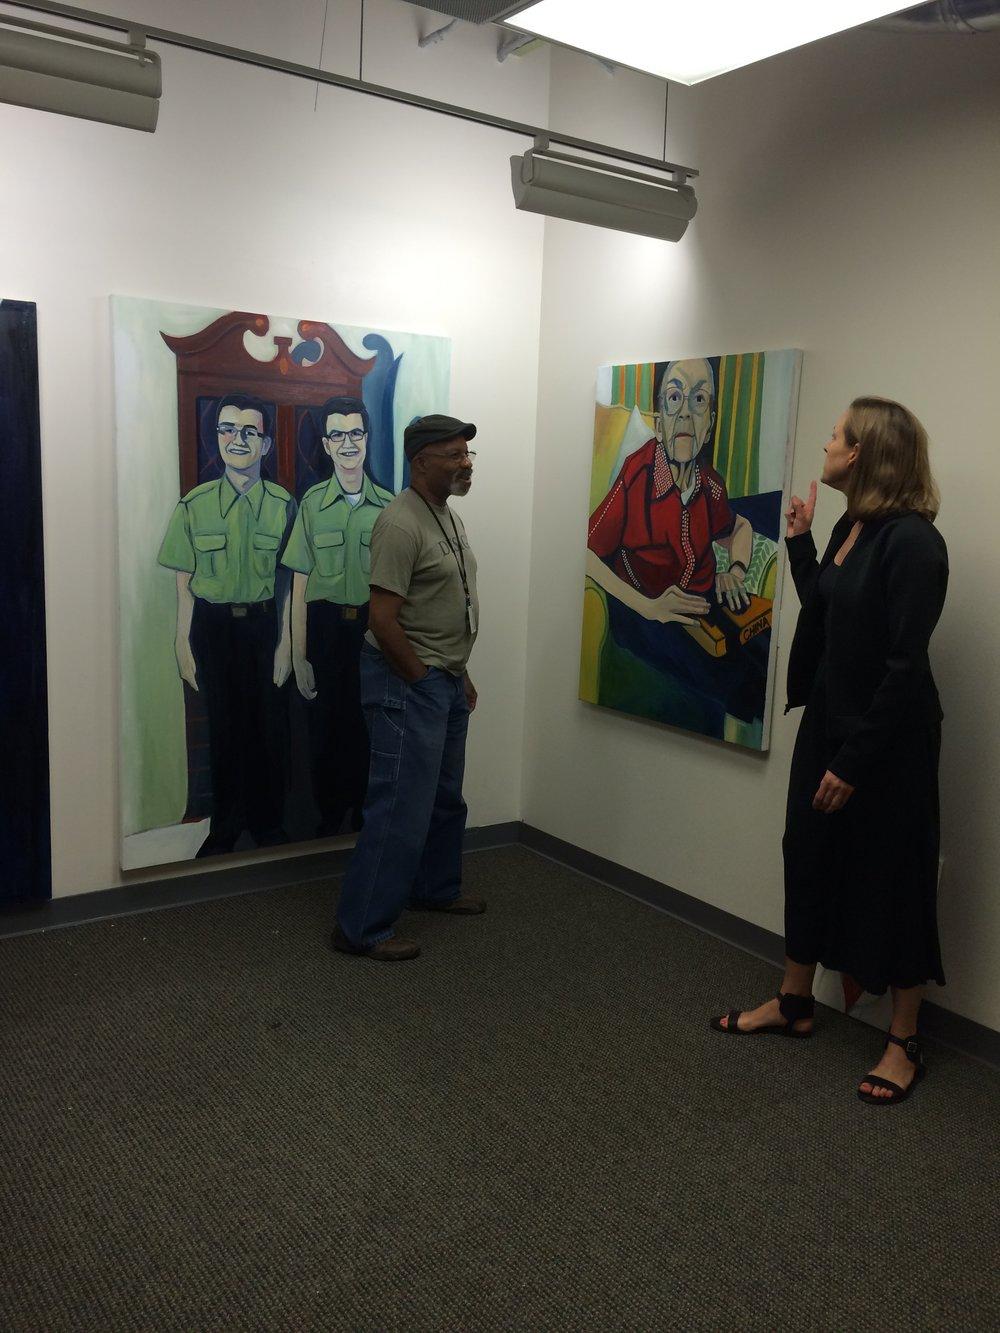 Sarah showing Romeo her work